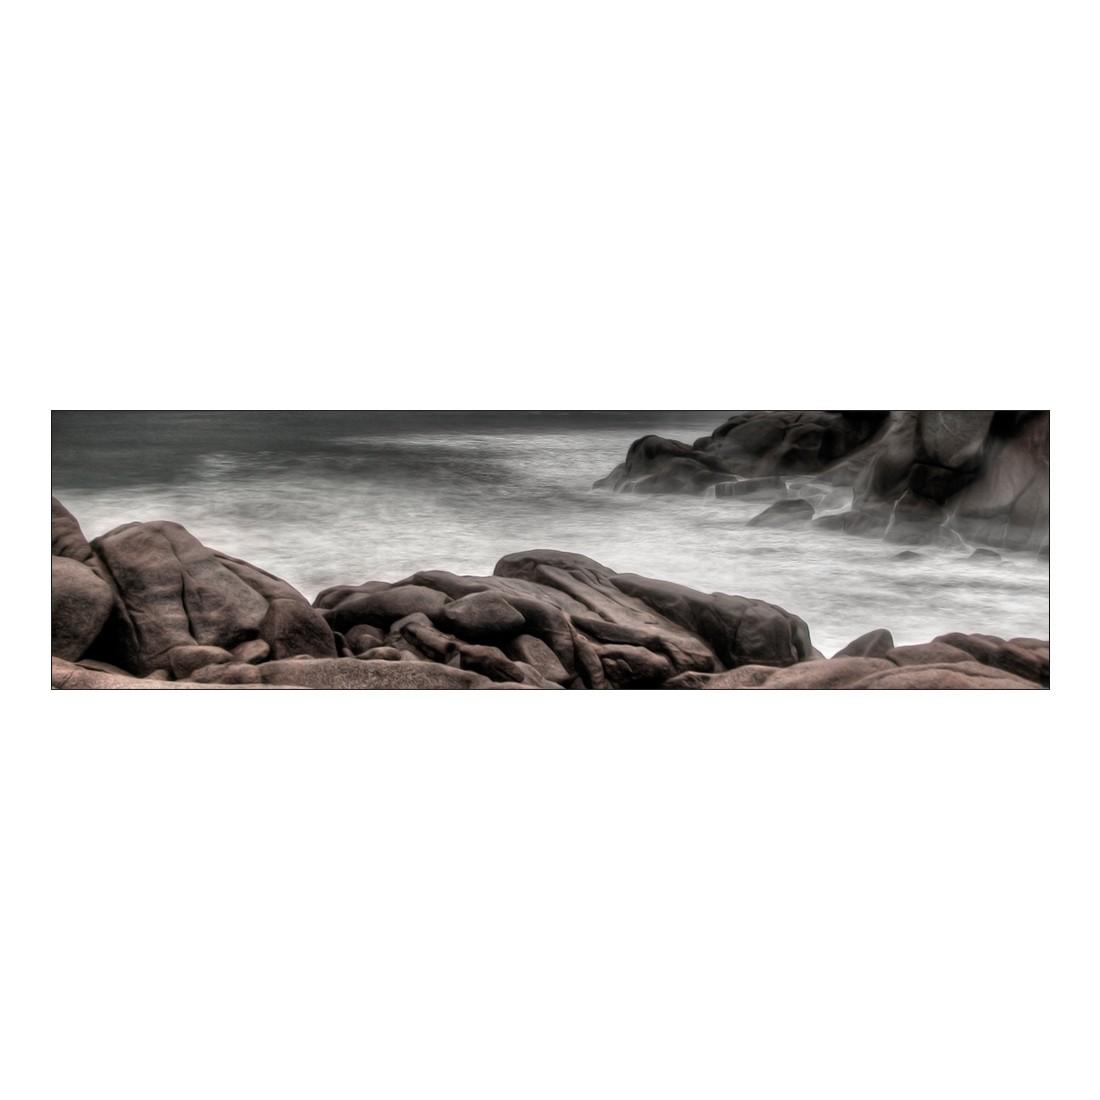 Leinwandbild Meeresbucht – 120 x 30cm, Gallery of Innovative Art jetzt kaufen